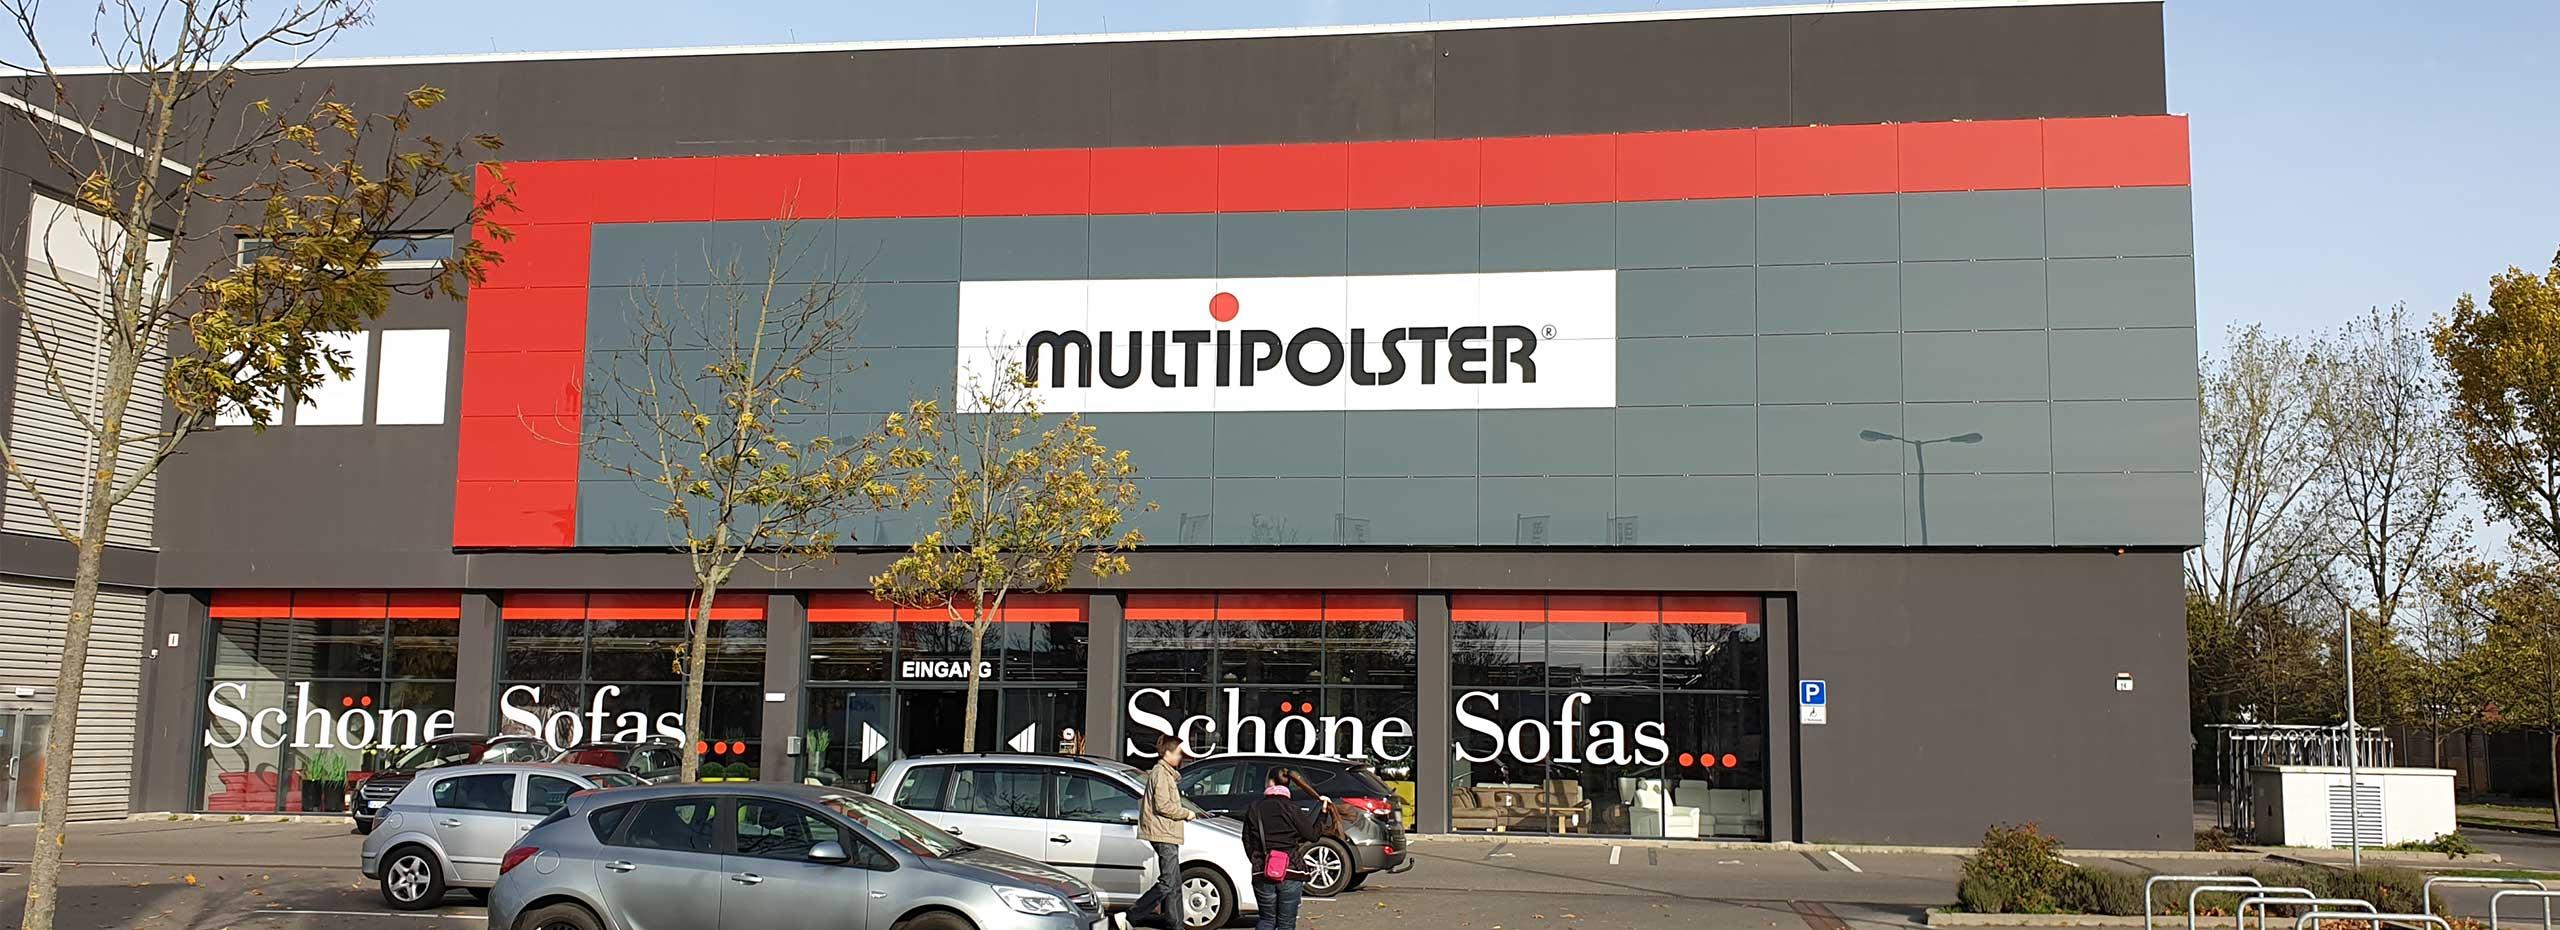 Multipolster - Berlin Alt-Mahlsdorf